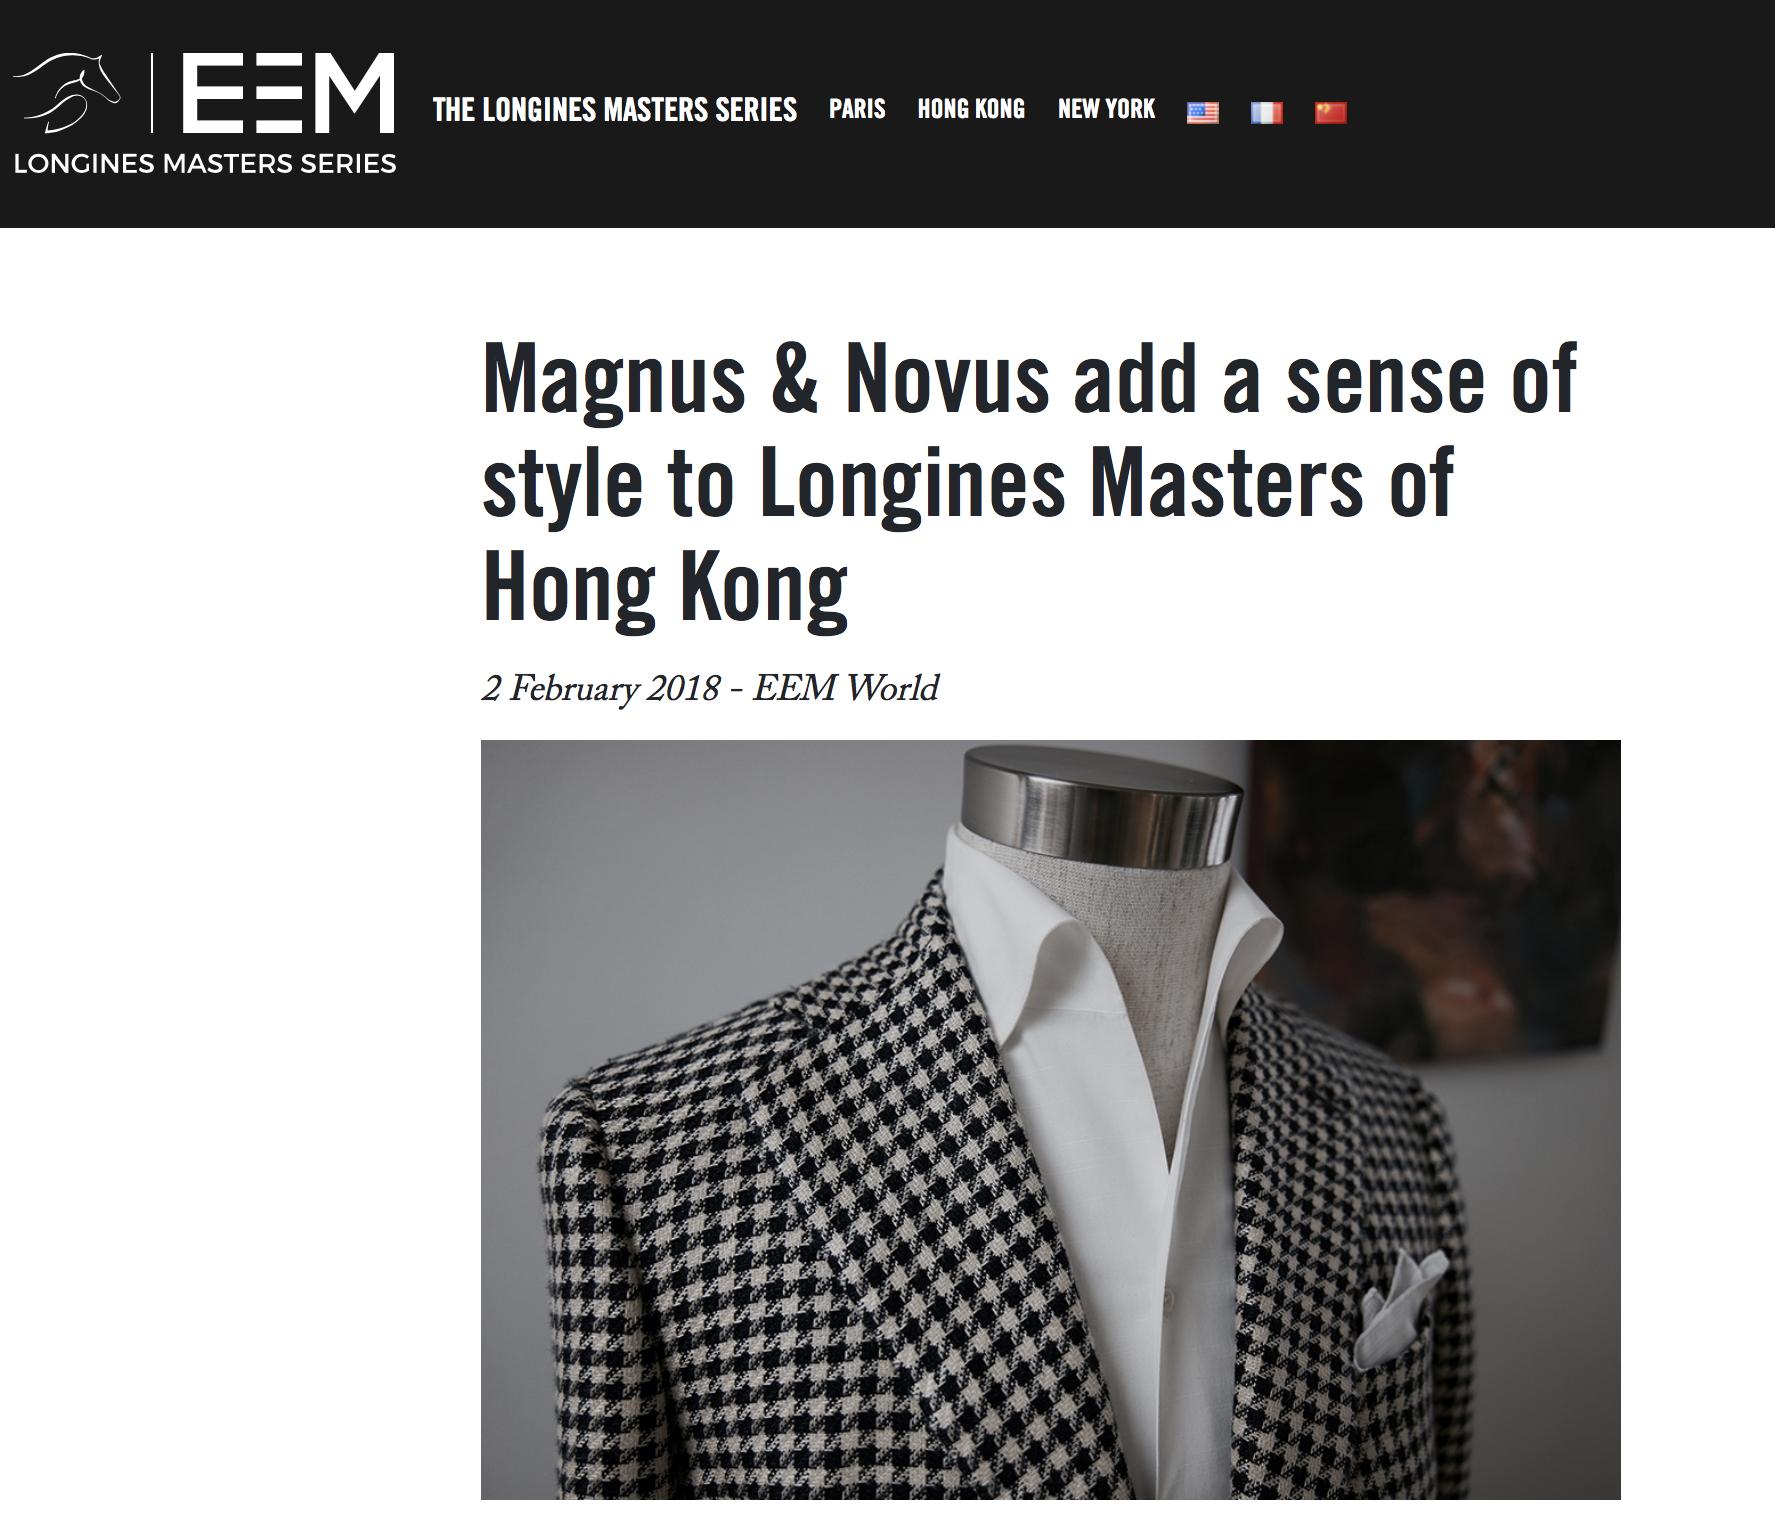 Magnus-&-Novus-at-Longines-Masters-Bespoke-Menswear